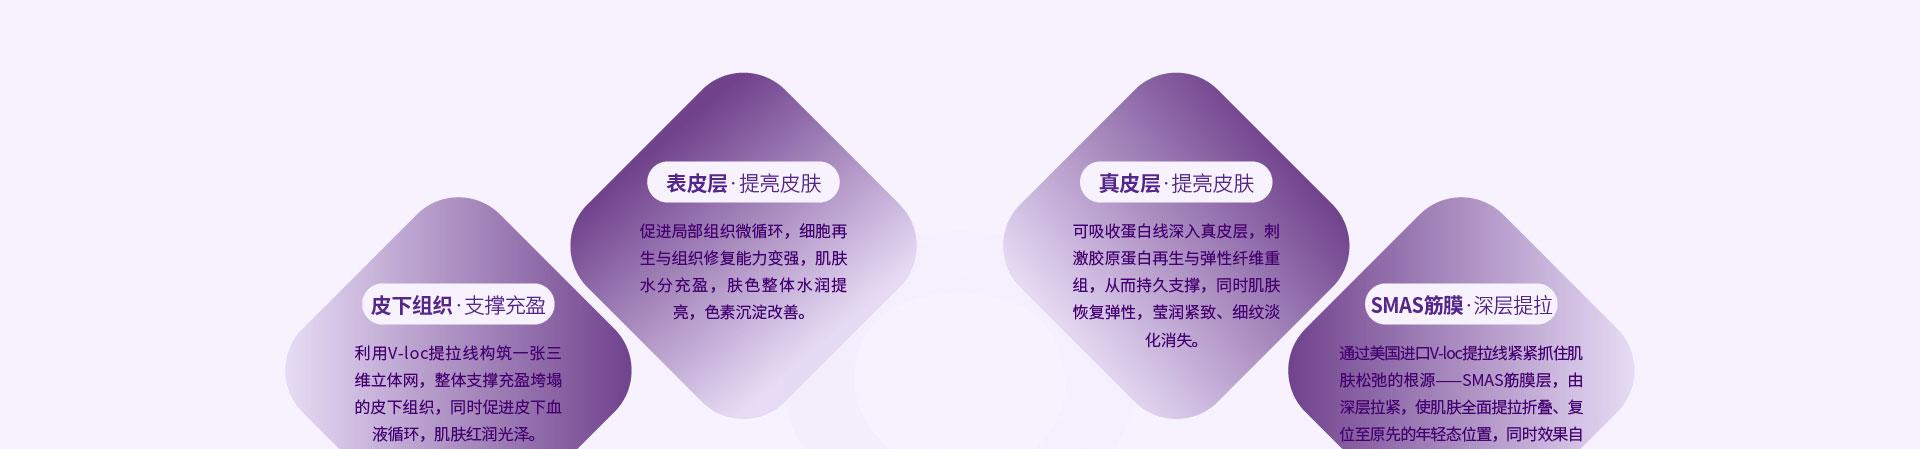 龙8娱乐long_龙8娱乐long88long885_龙8娱乐long88